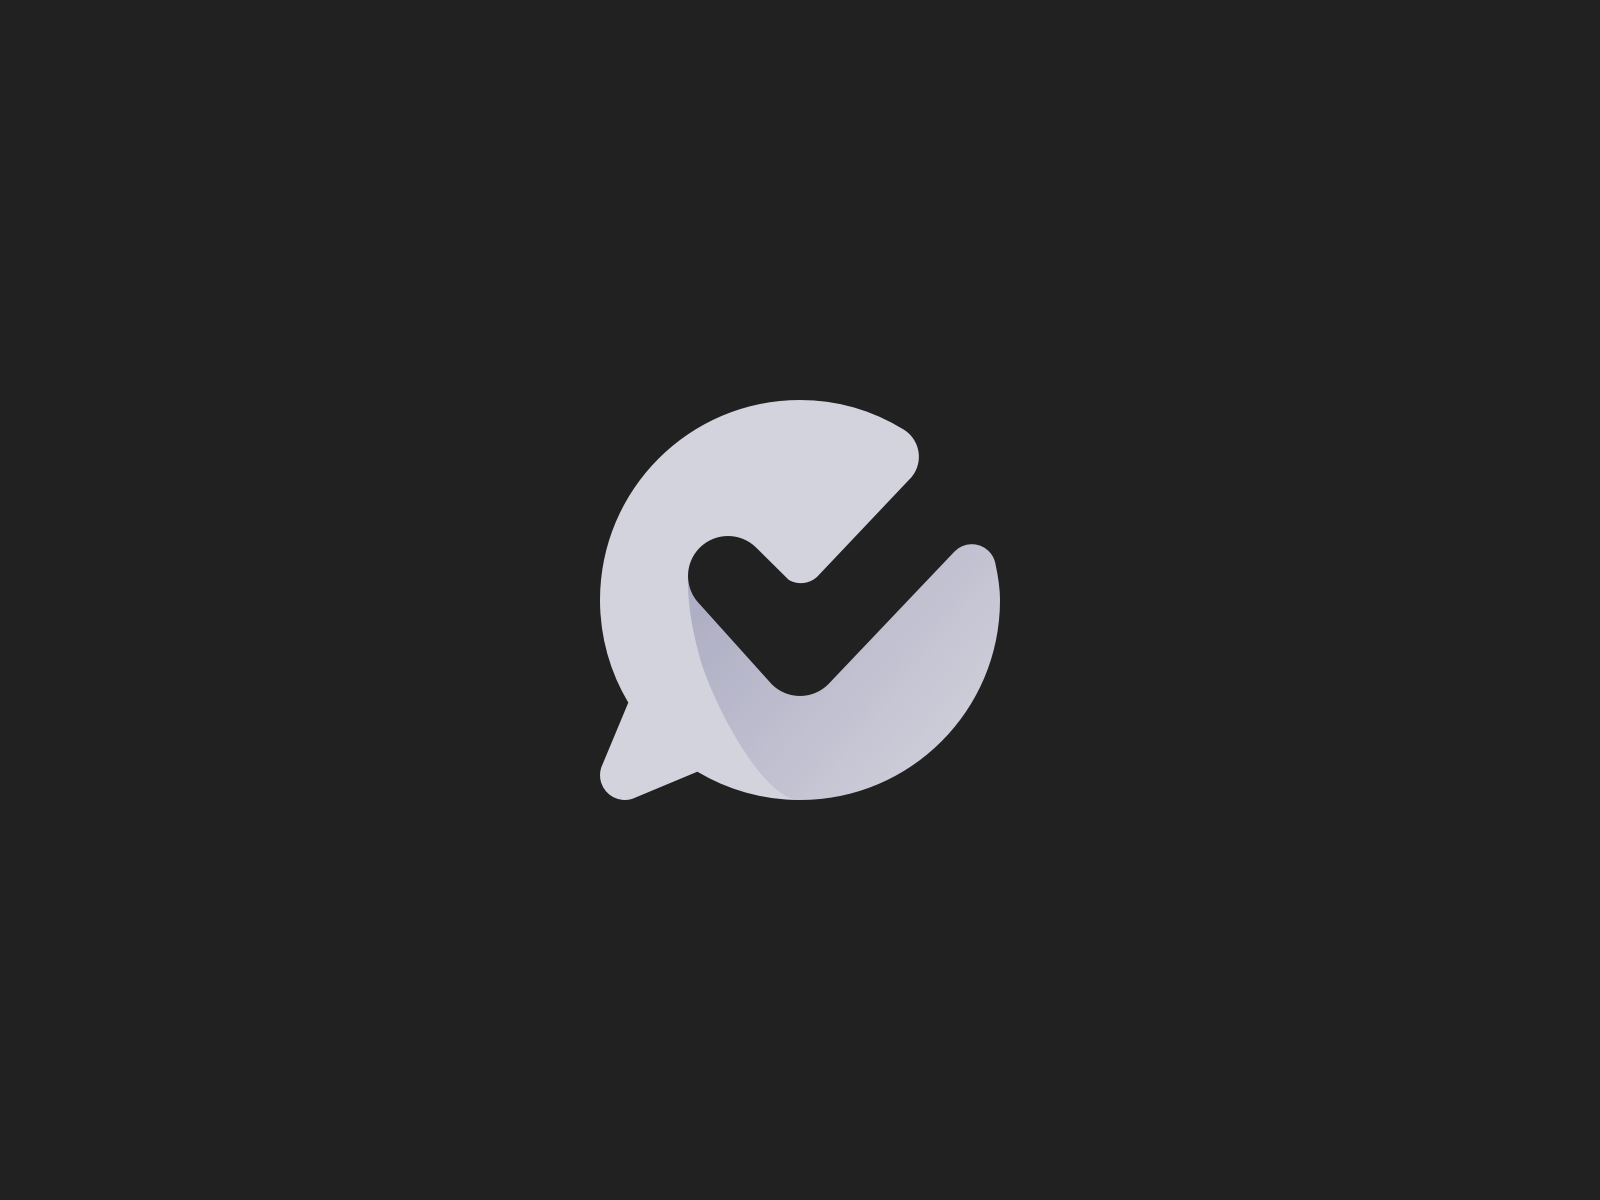 Chat Monogram Concept Concept Monogram Vimeo Logo